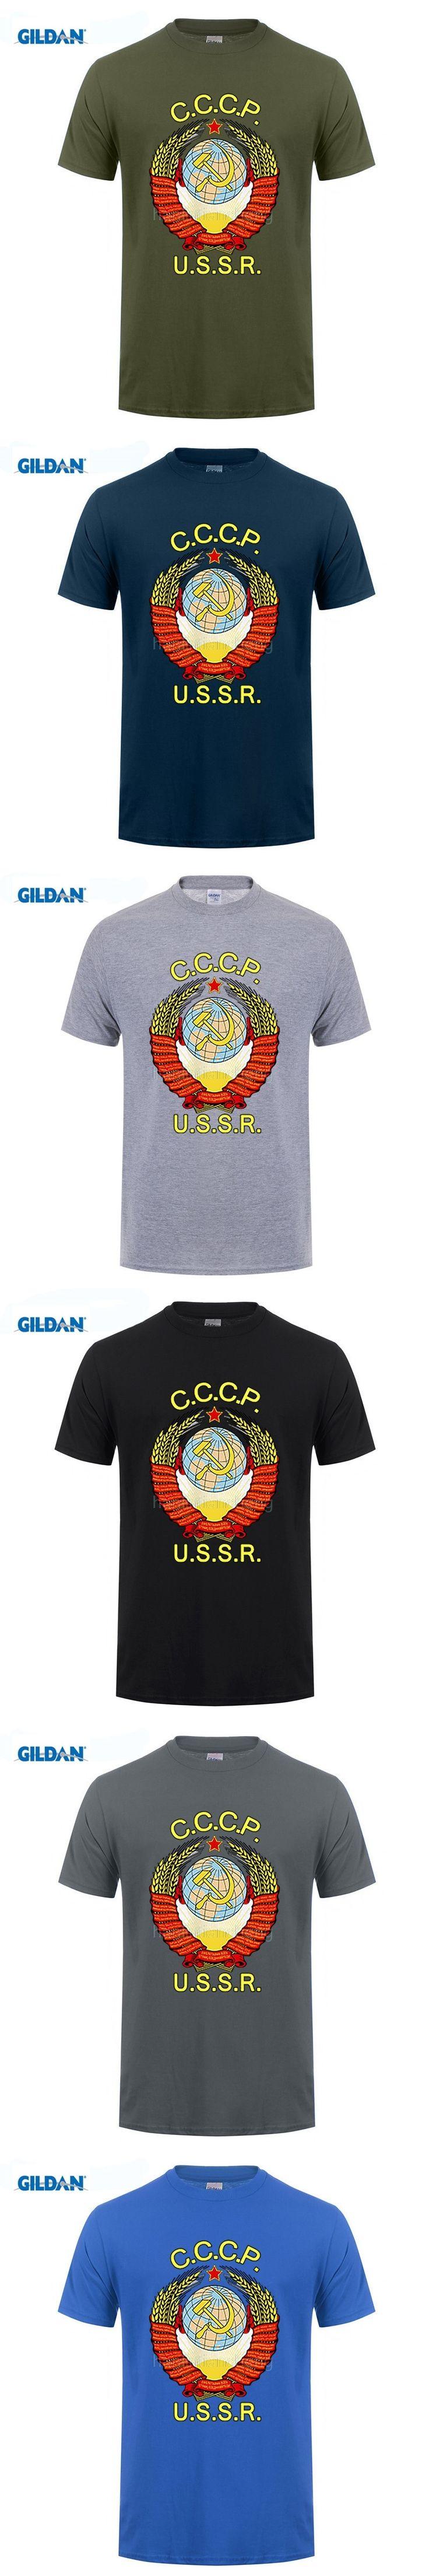 GILDAN 100% Cotton O-Neck customised T-shirt Hot Fashion CCCP Russian T Shirt USSR Soviet Union KGB Moscow T-shirt